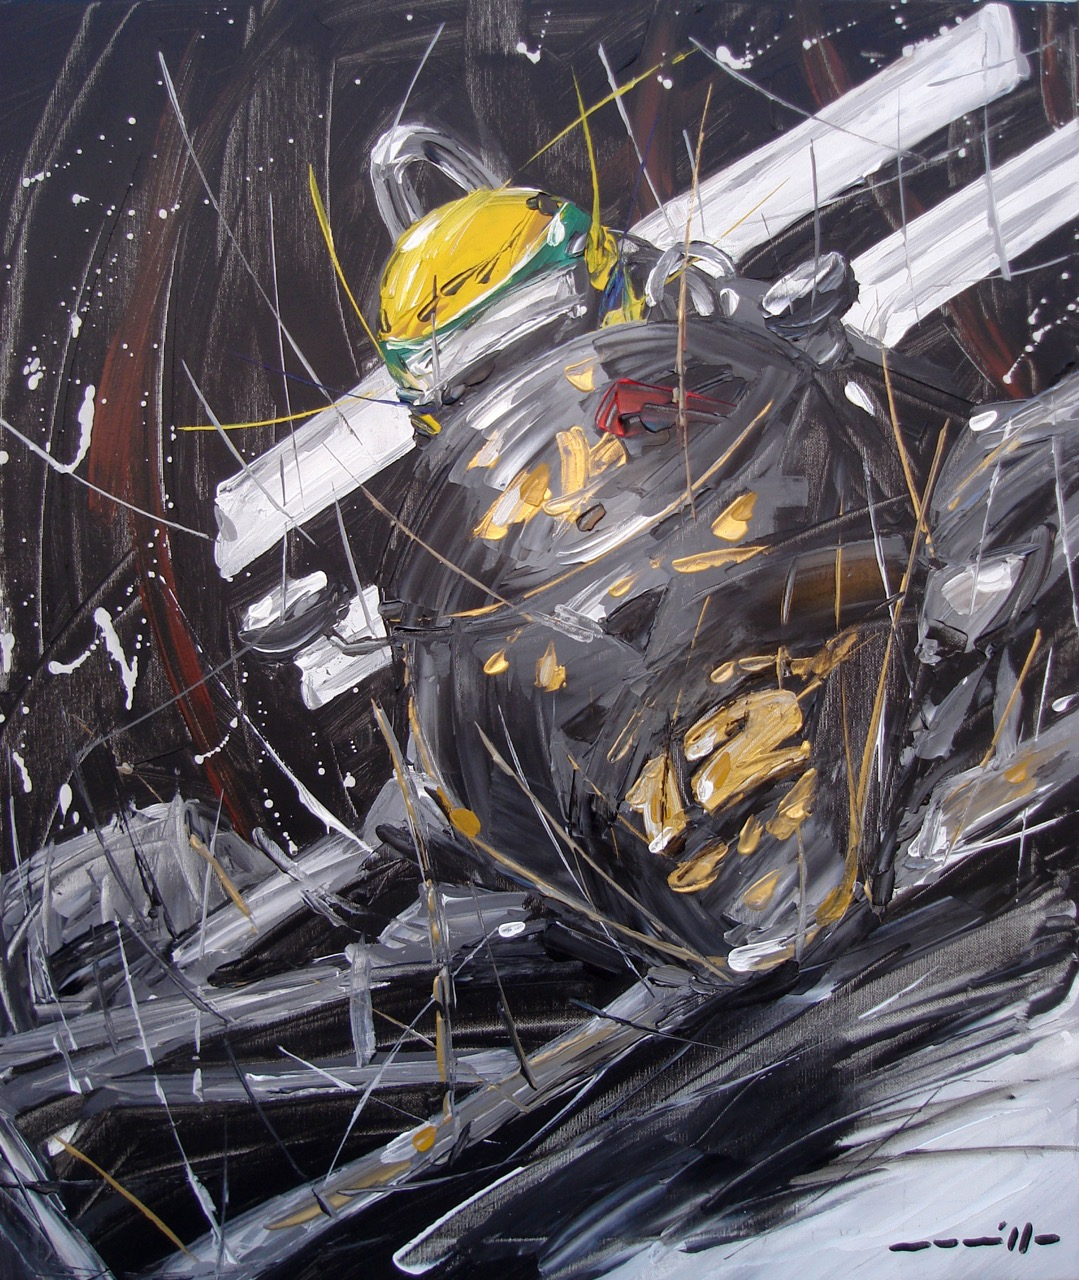 Senna_LotusJPS64x76.jpg